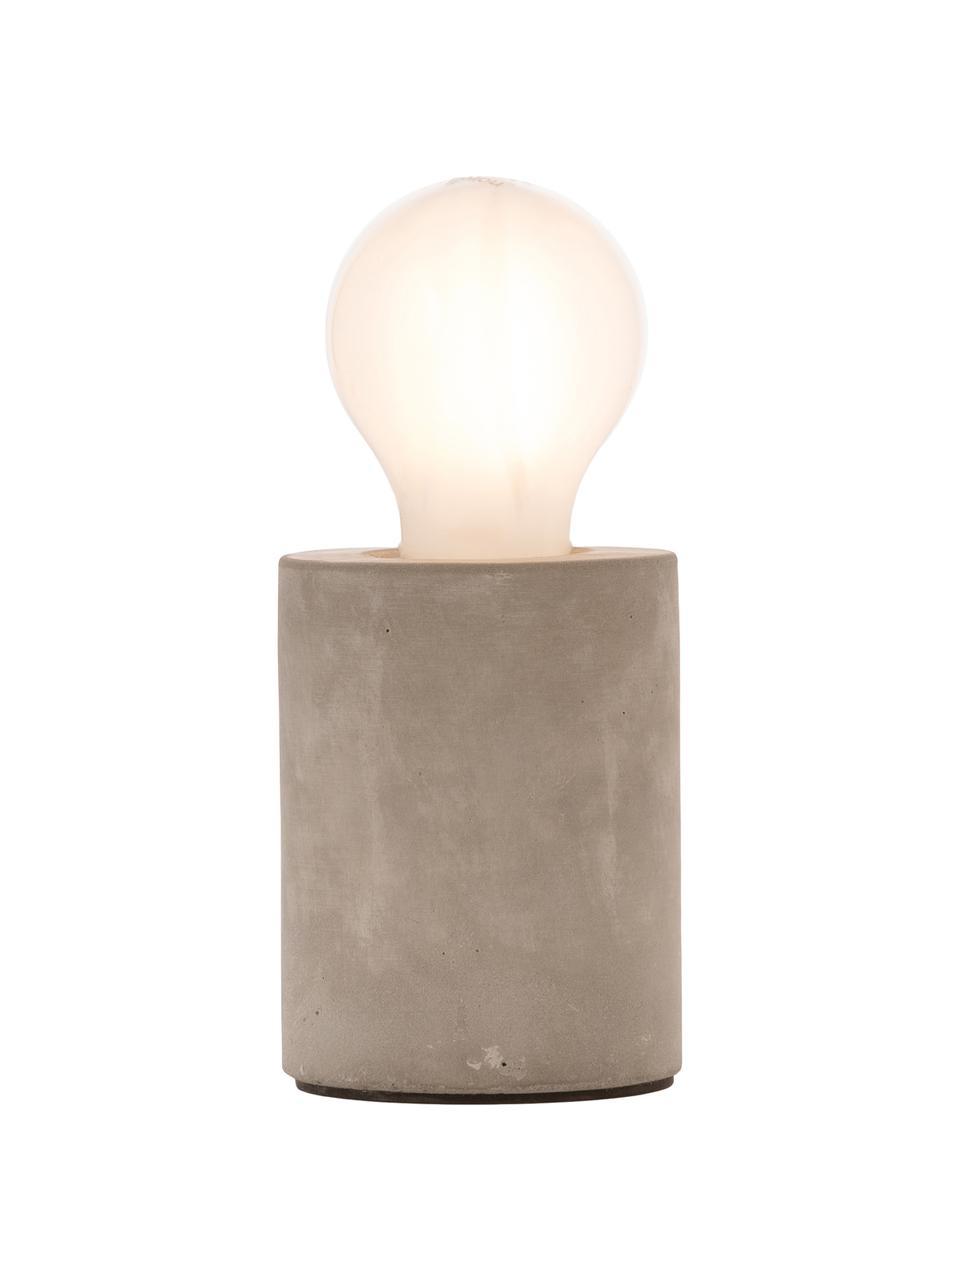 Lampadina E27, 8W, dimmerabile, bianco caldo, 1 pz, Paralume: materiale sintetico, Base lampadina: alluminio, Bianco, Ø 8 x Alt. 10 cm